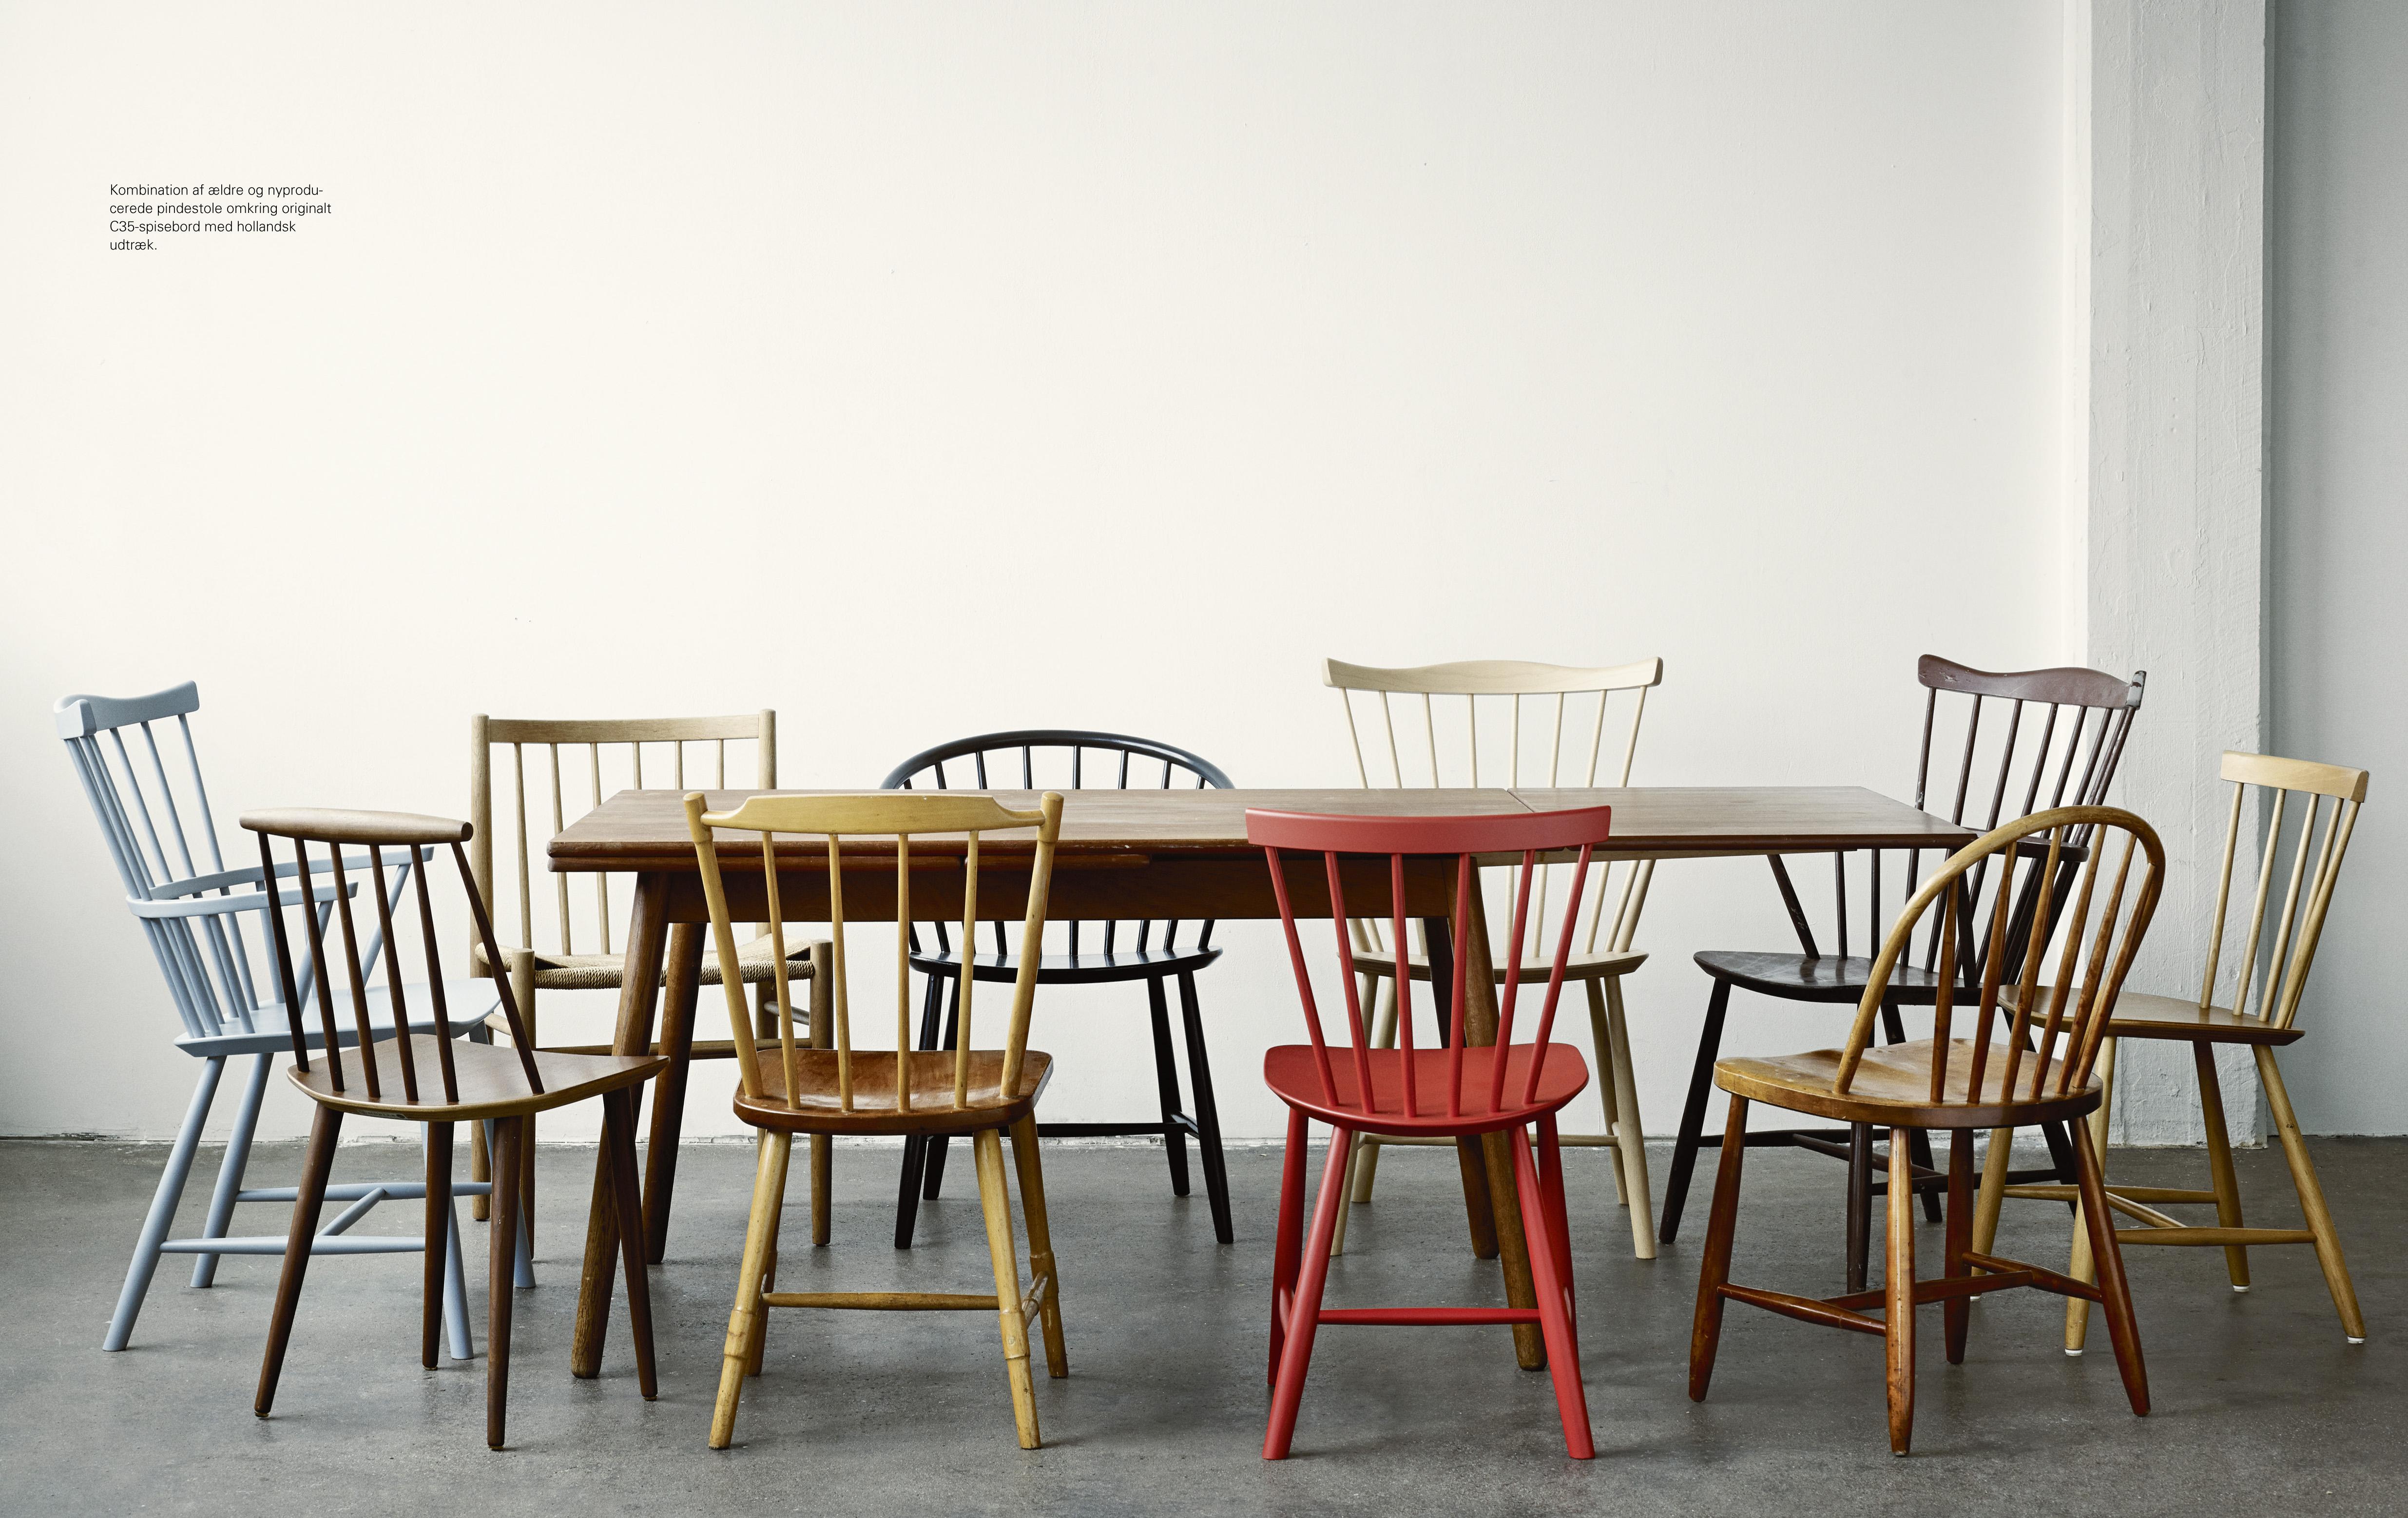 fdb møbler Lower East fdb møbler